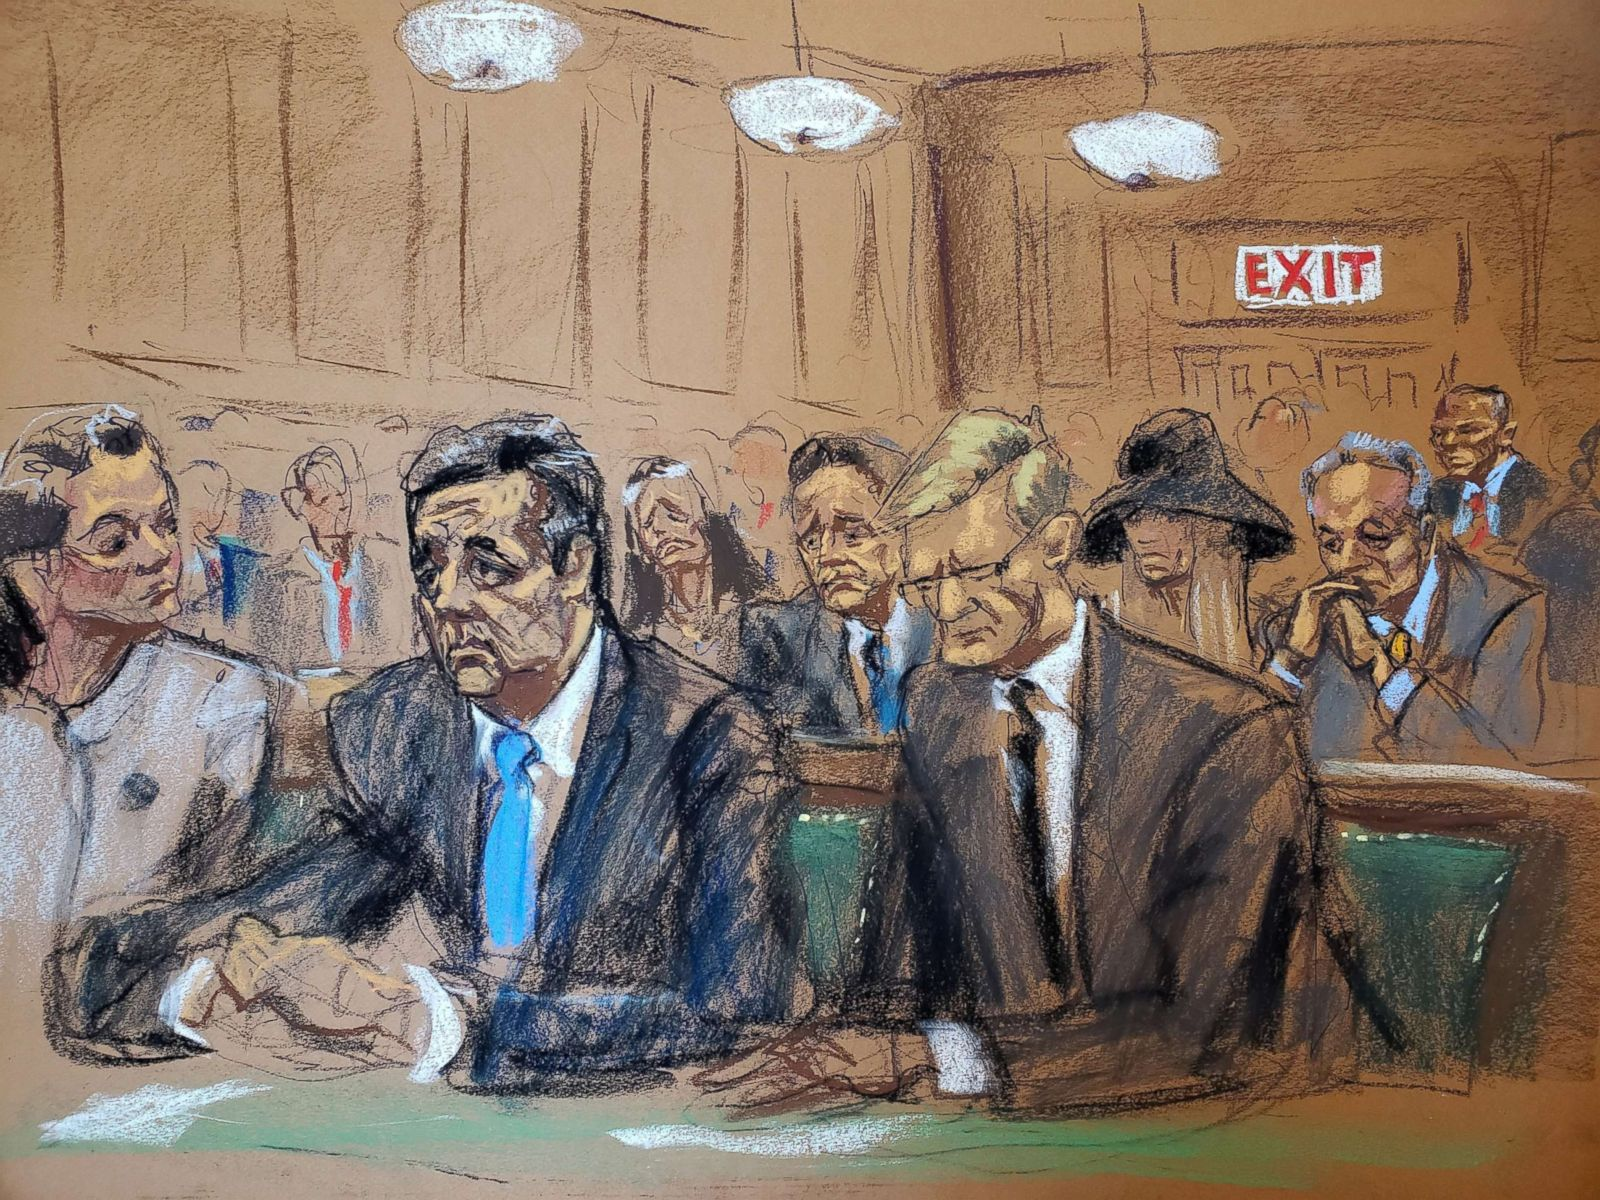 Michael Cohen, in emotional courtroom plea for leniency